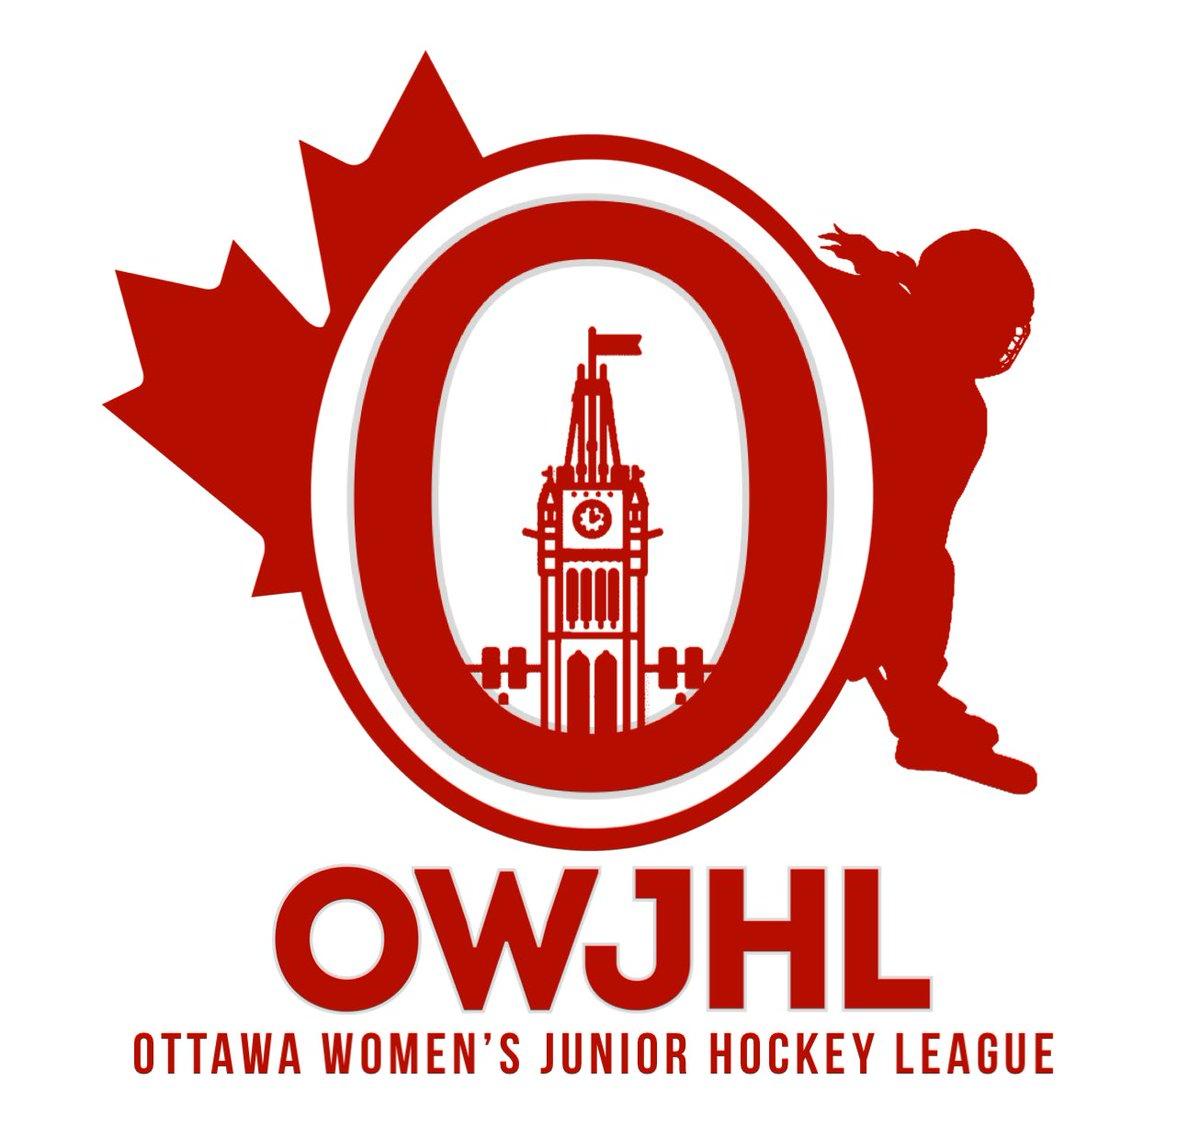 Ottawa Women's Junior Hockey League